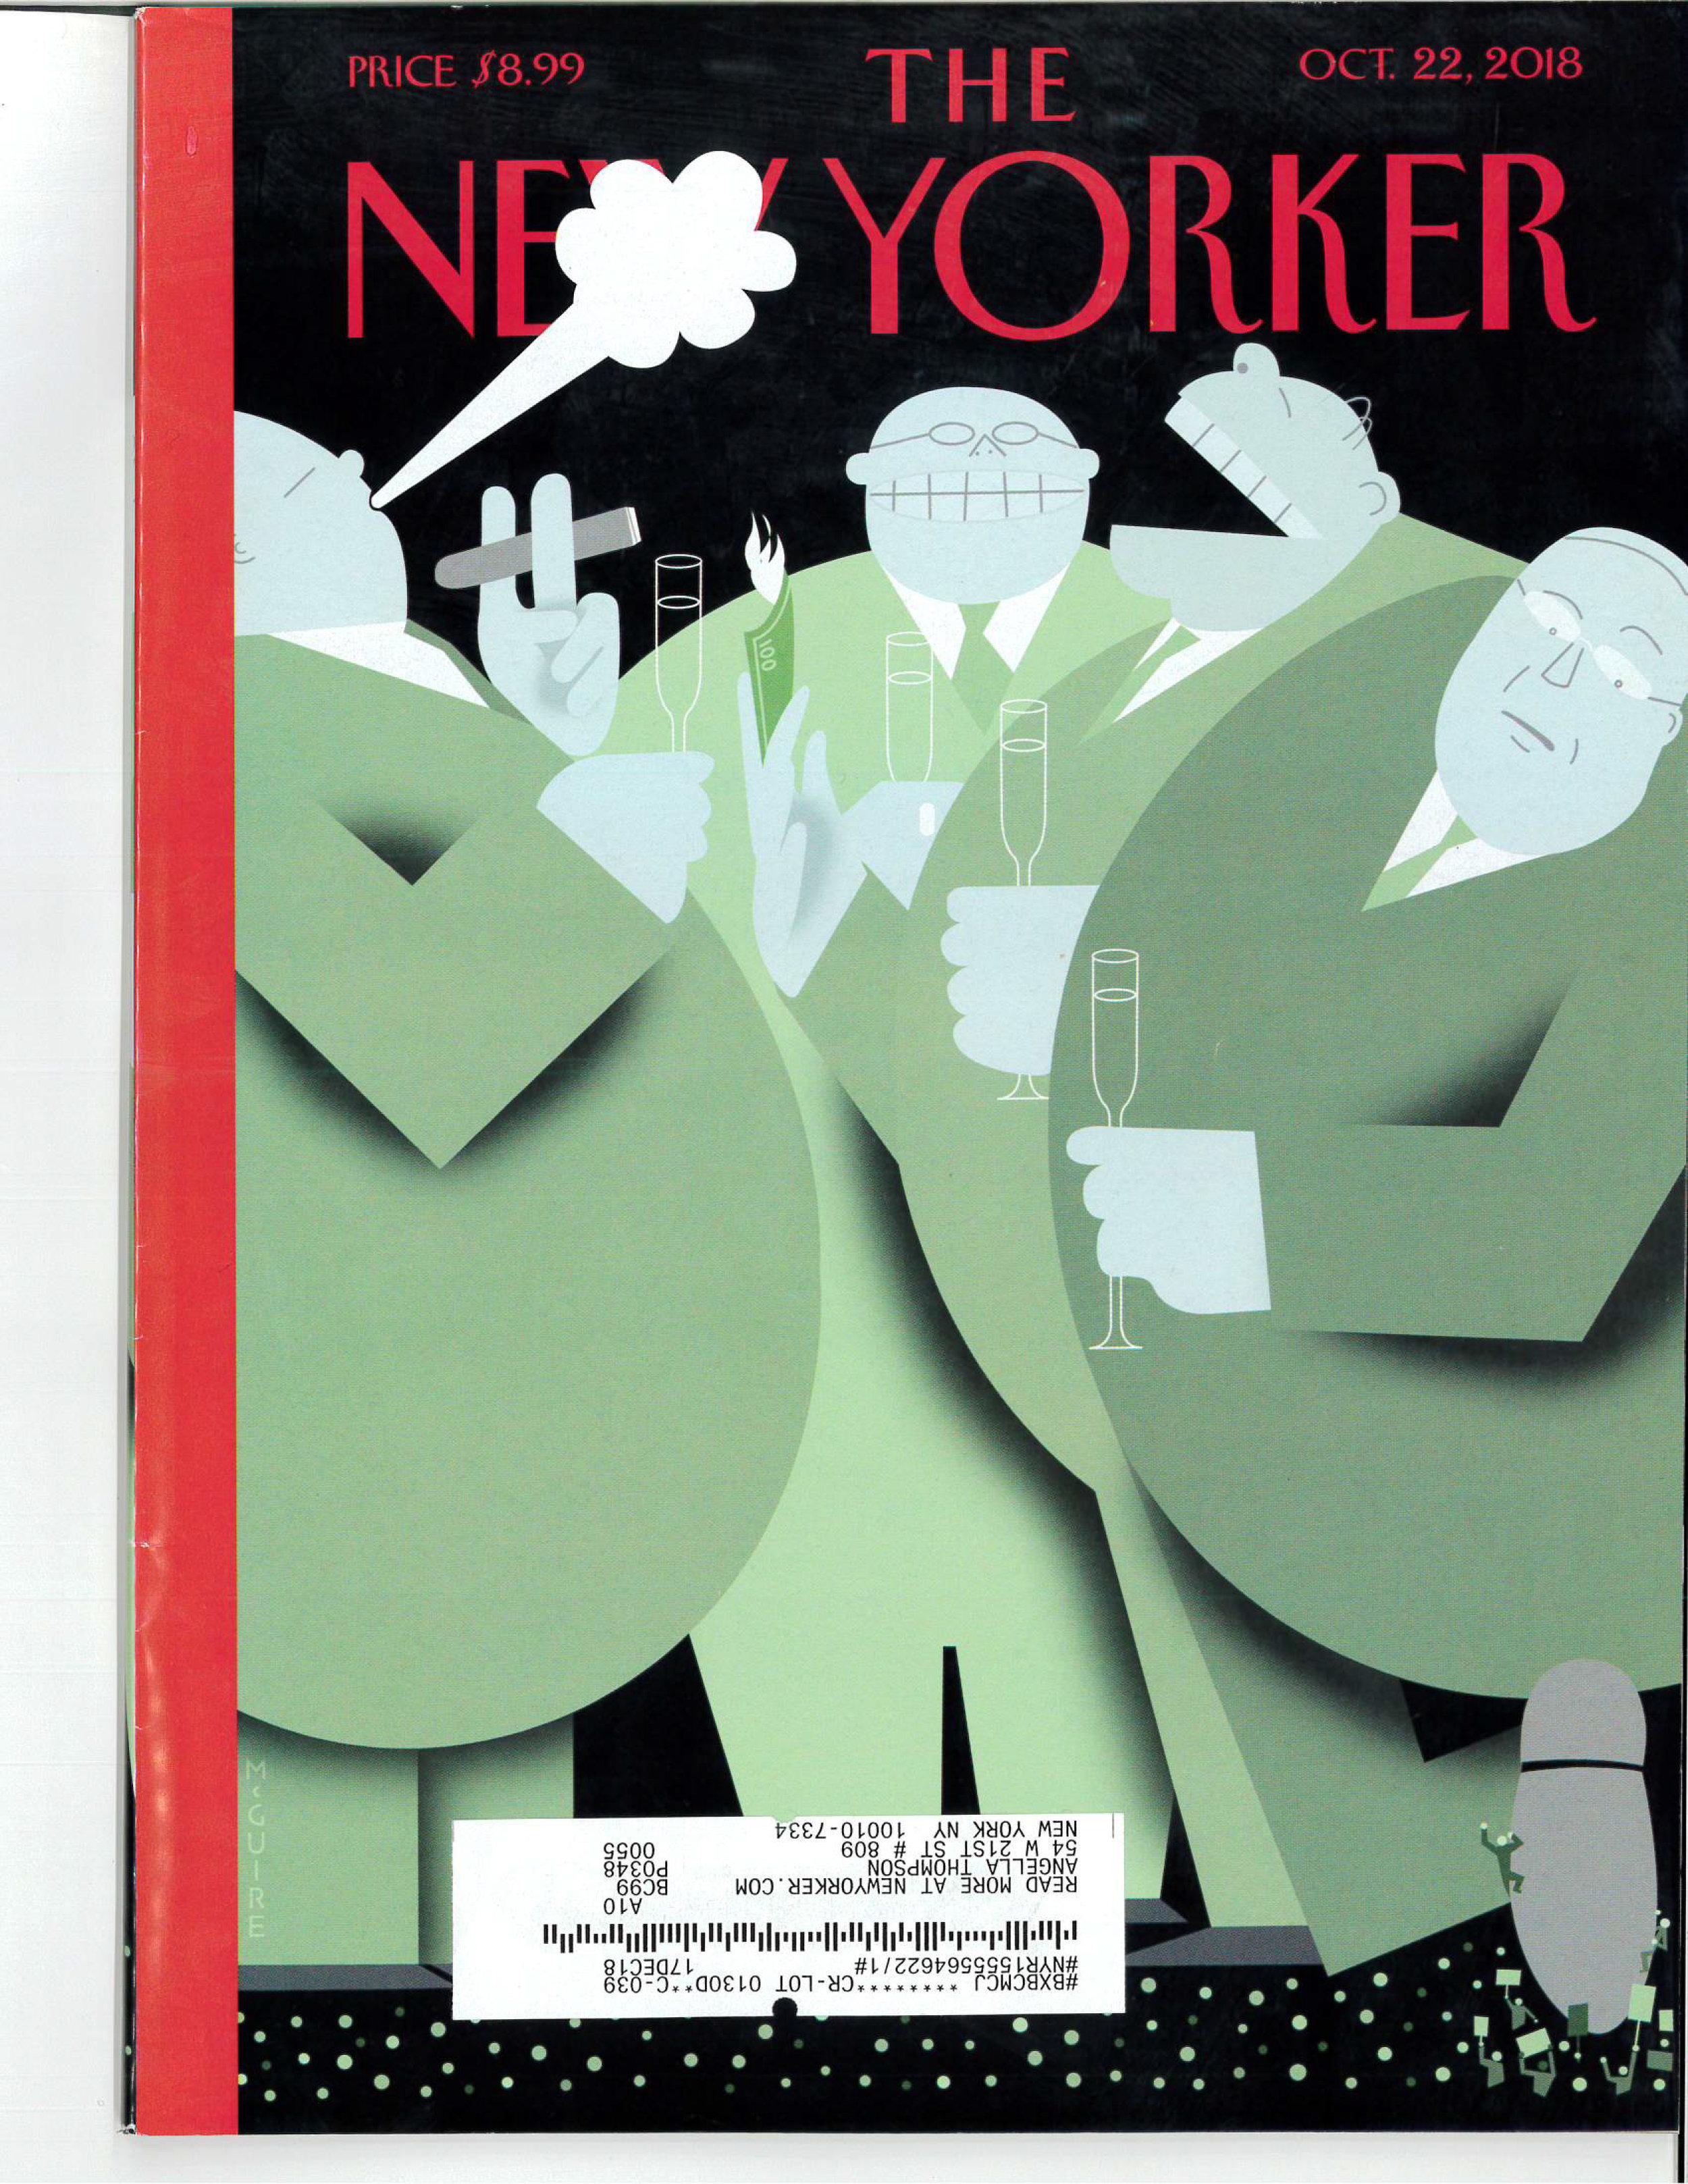 The New Yorker 10_22_18-1.jpg